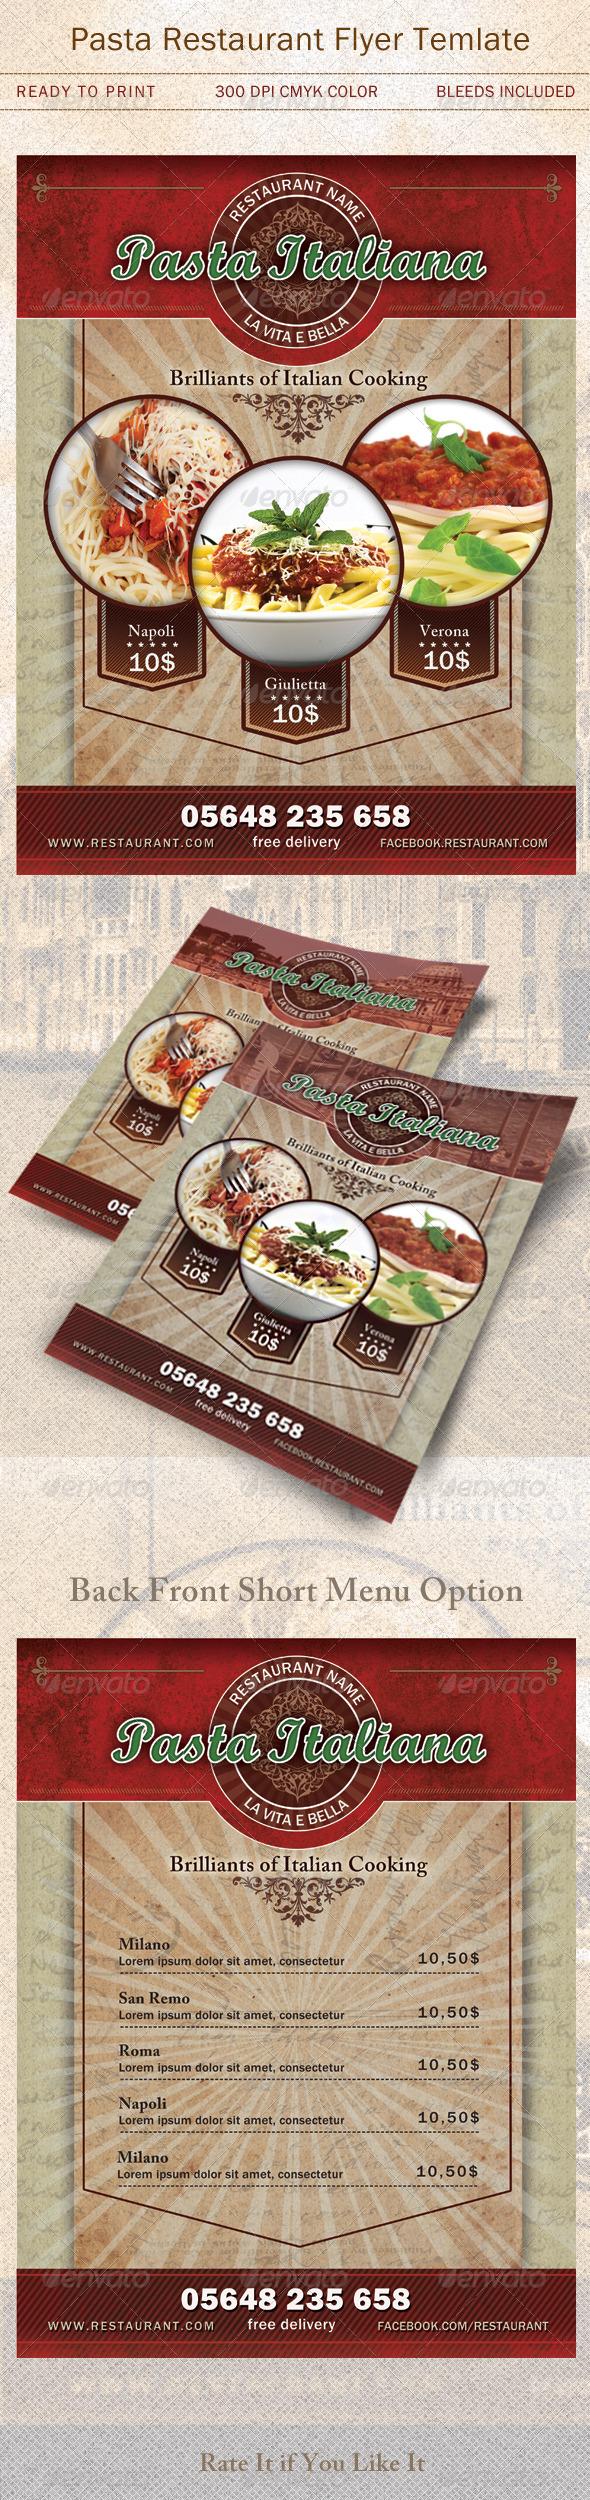 Pasta Restaurant Flyer Template - Restaurant Flyers